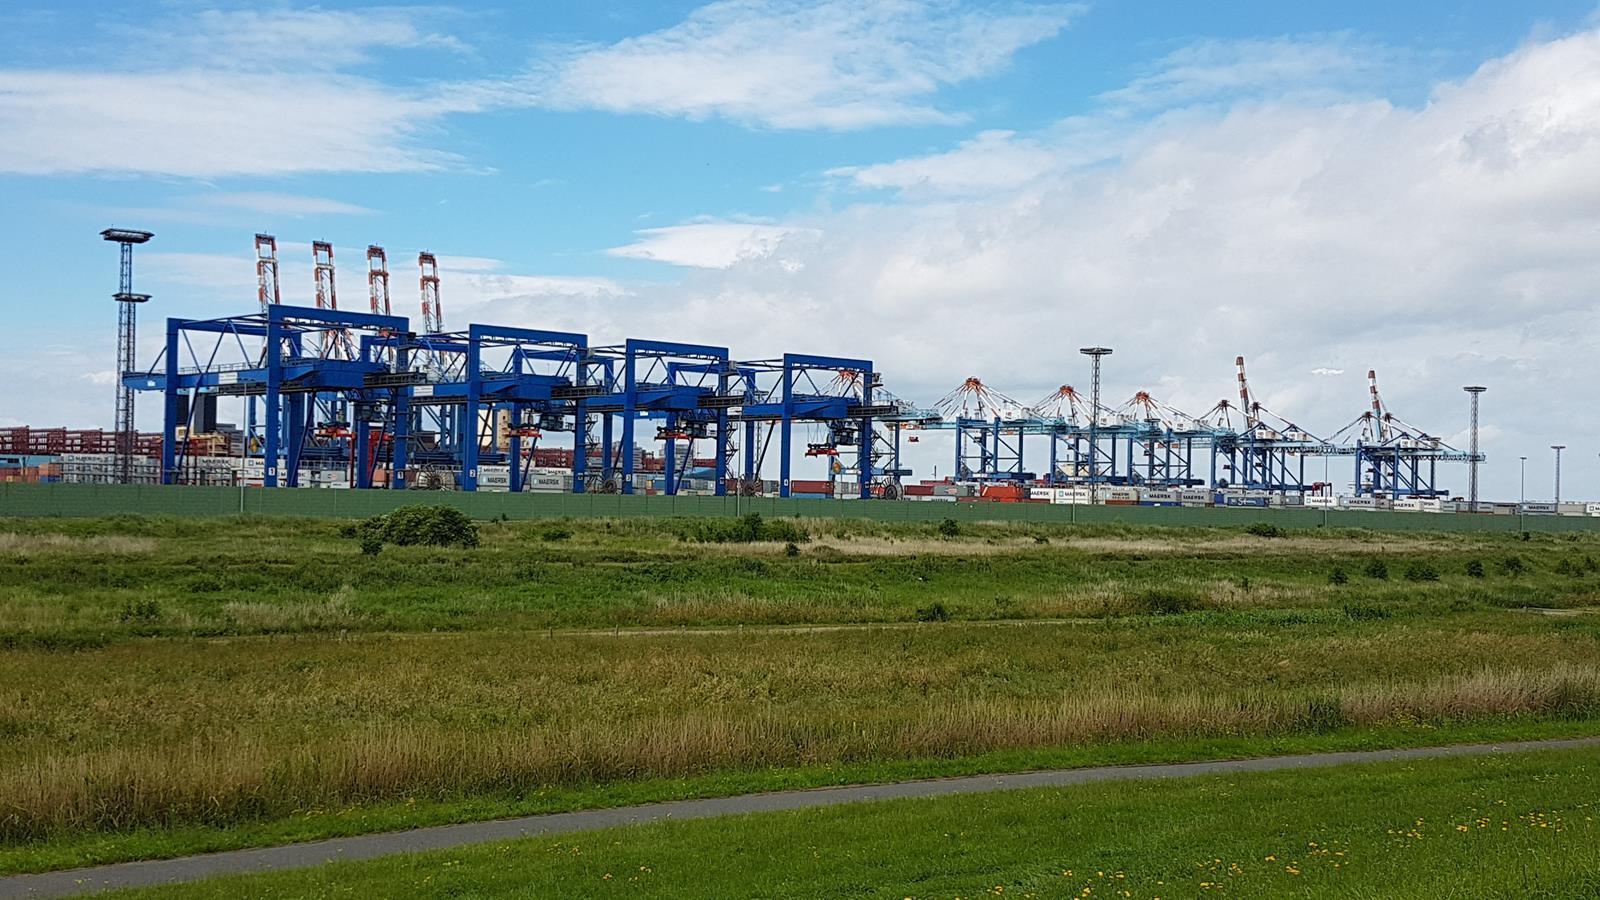 Europort Bremerhaven